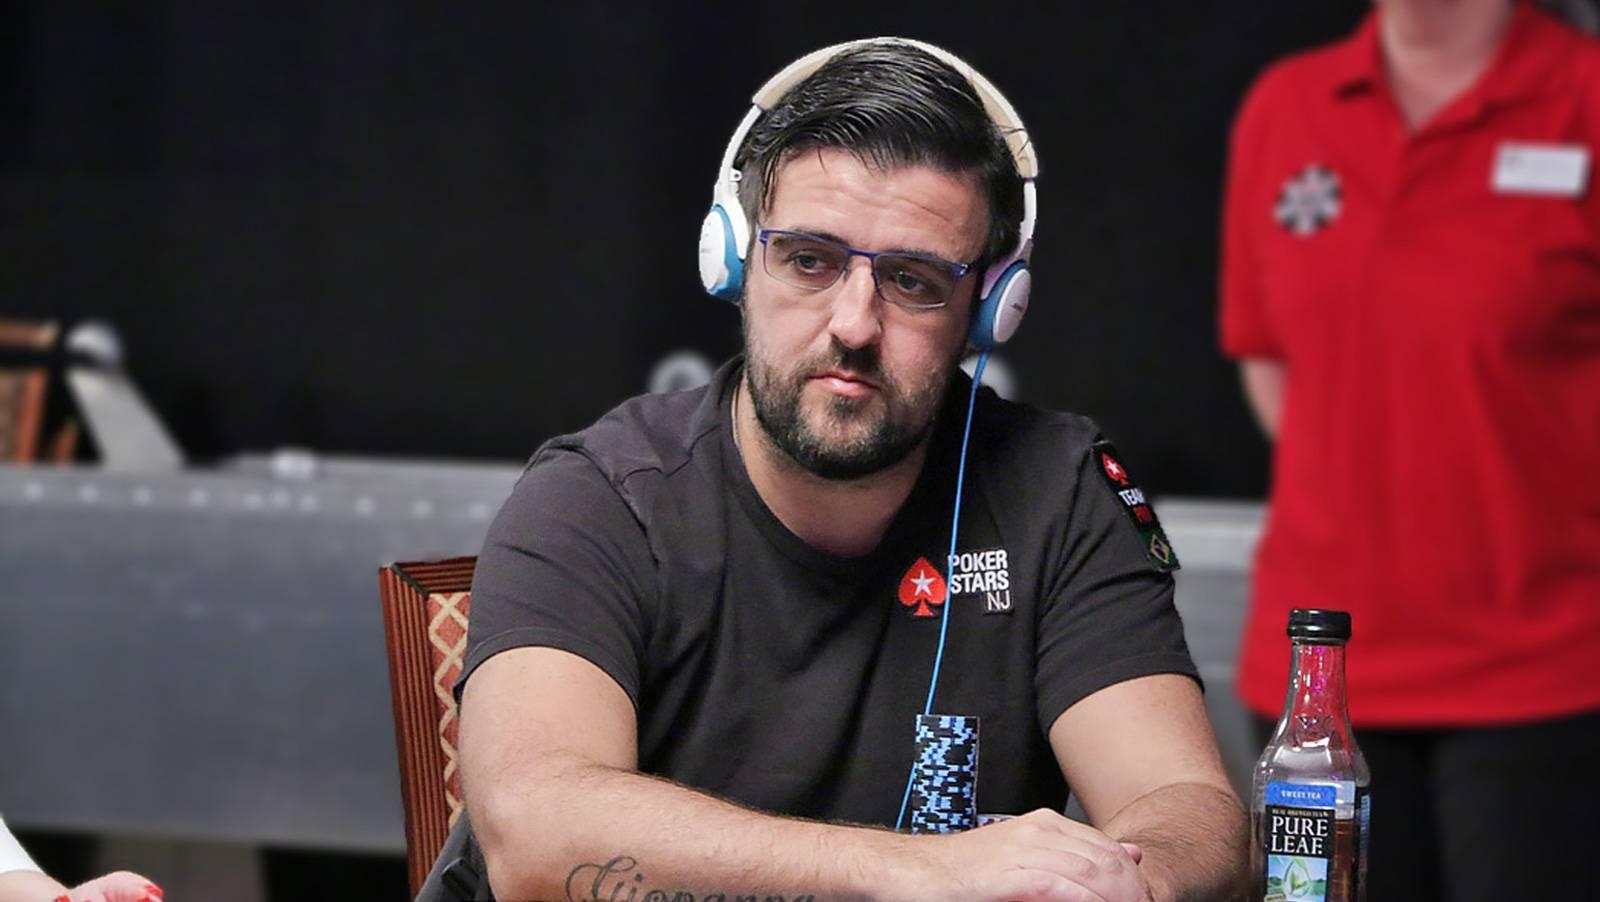 Andre Akkari helping spread poker like a fever